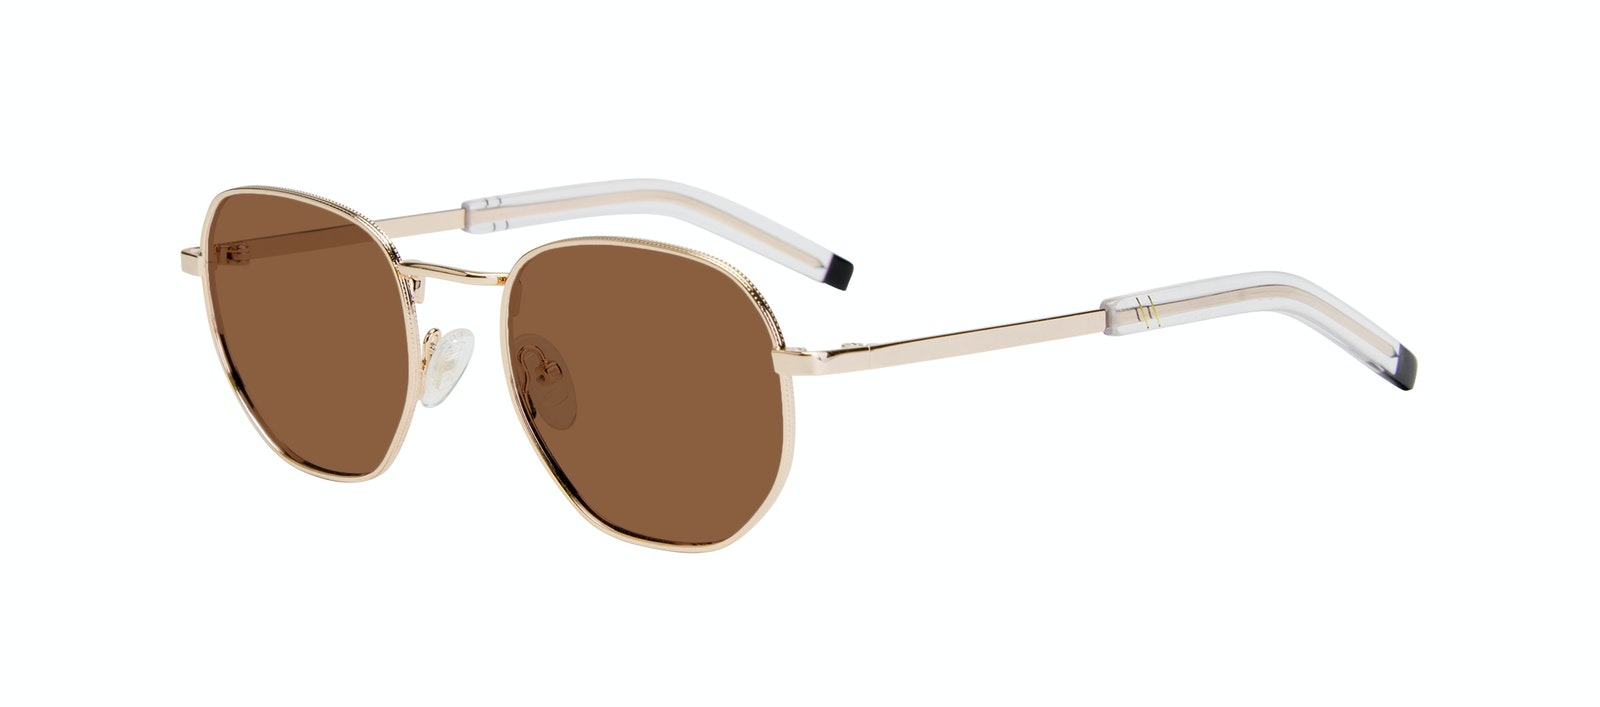 Affordable Fashion Glasses Round Sunglasses Men Rise Gold Tilt